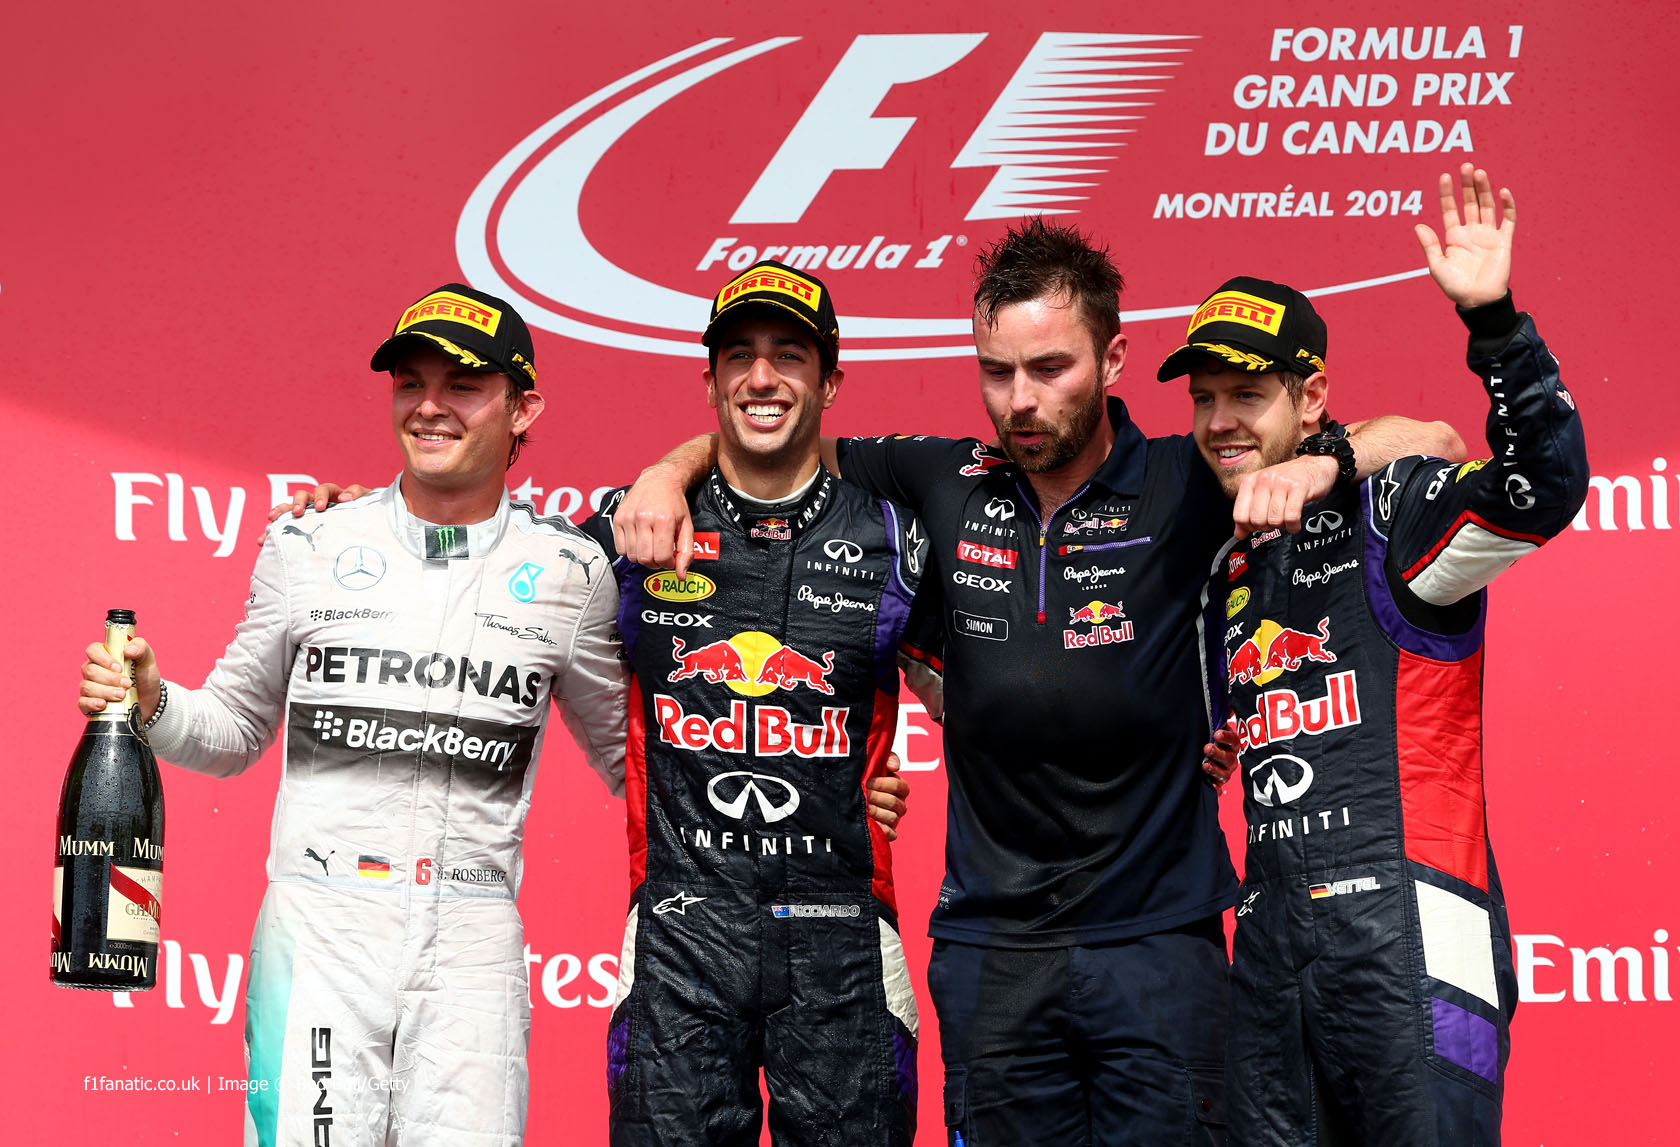 Nico Rosberg, Daniel Ricciardo, Sebastian Vettel, Red Bull, Circuit Gilles Villeneuve, 2014